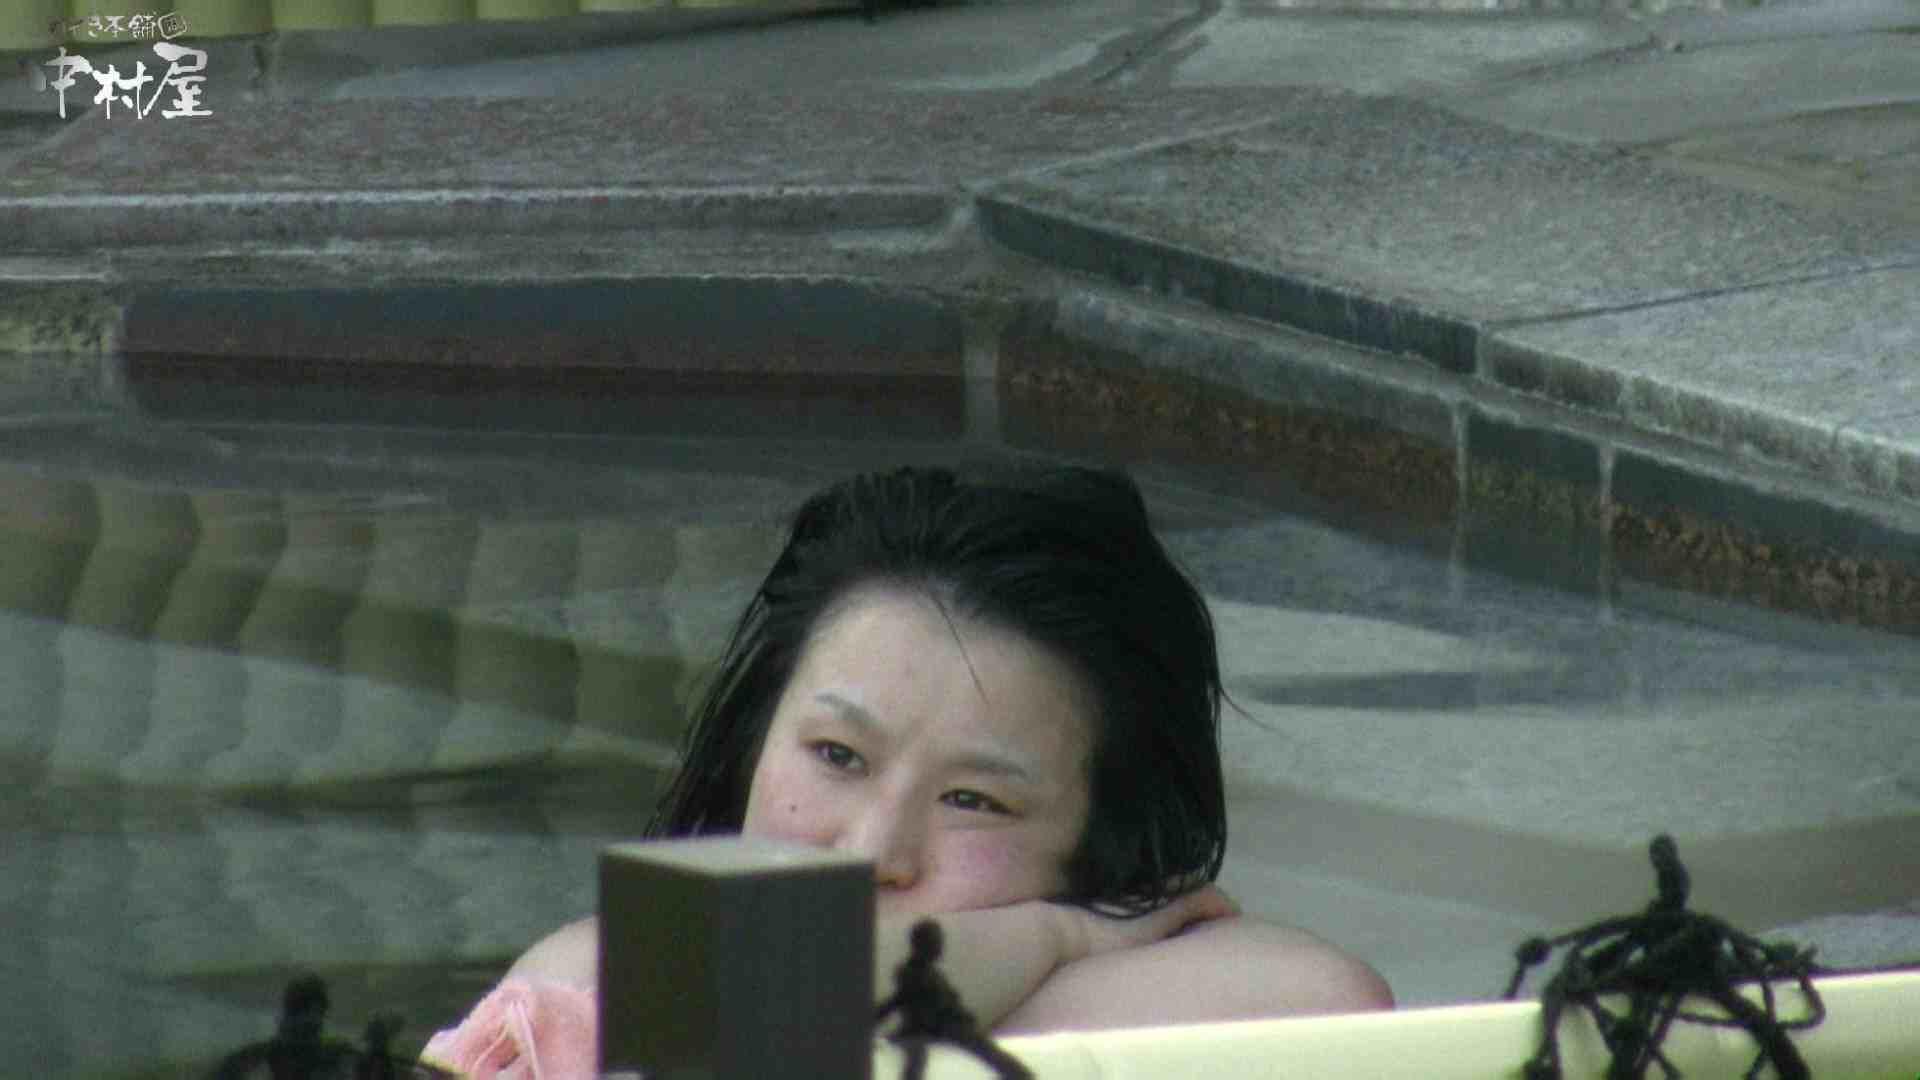 Aquaな露天風呂Vol.982 盗撮特撮 | OLのプライベート  13pic 13